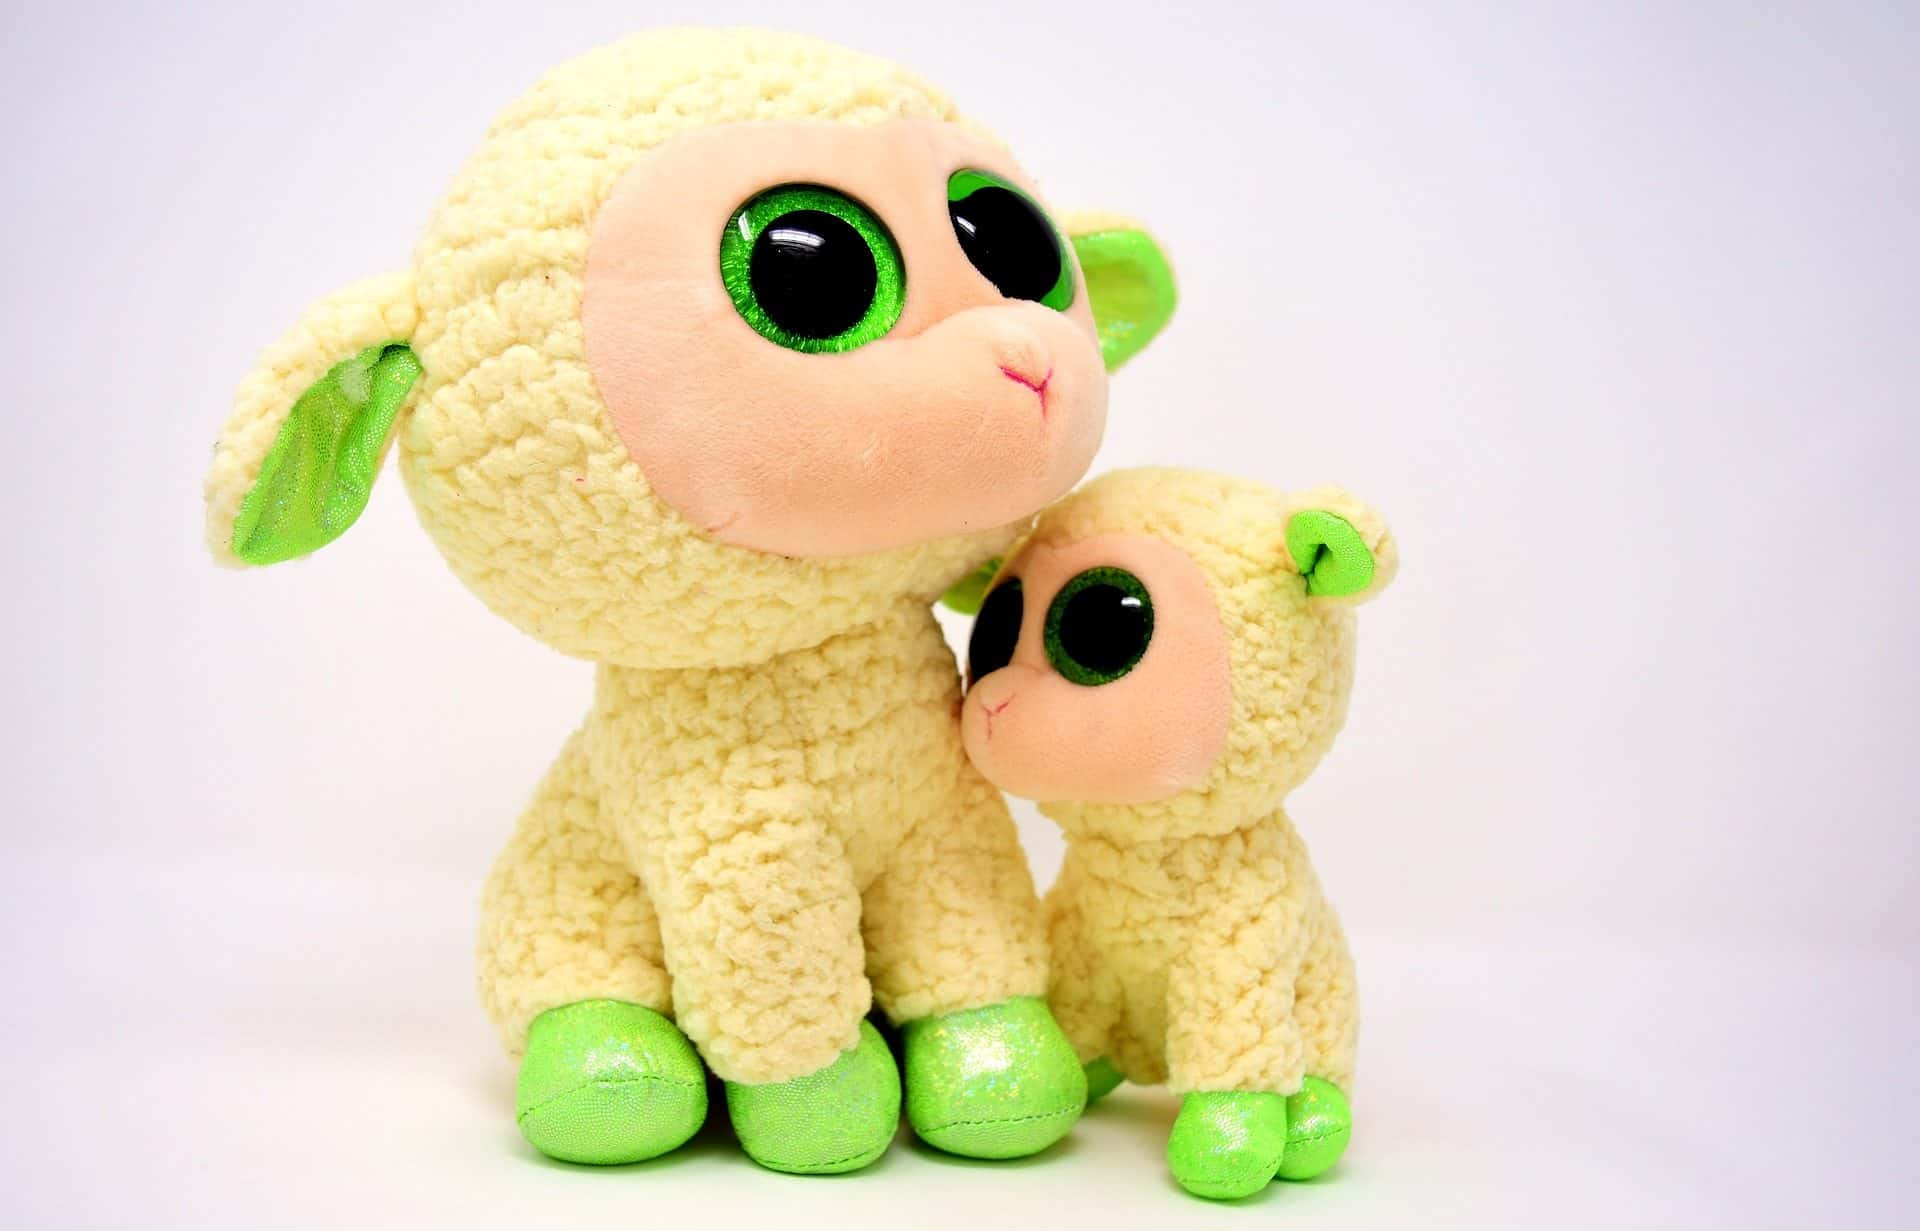 Stuffed Toy Animal For Online Esl